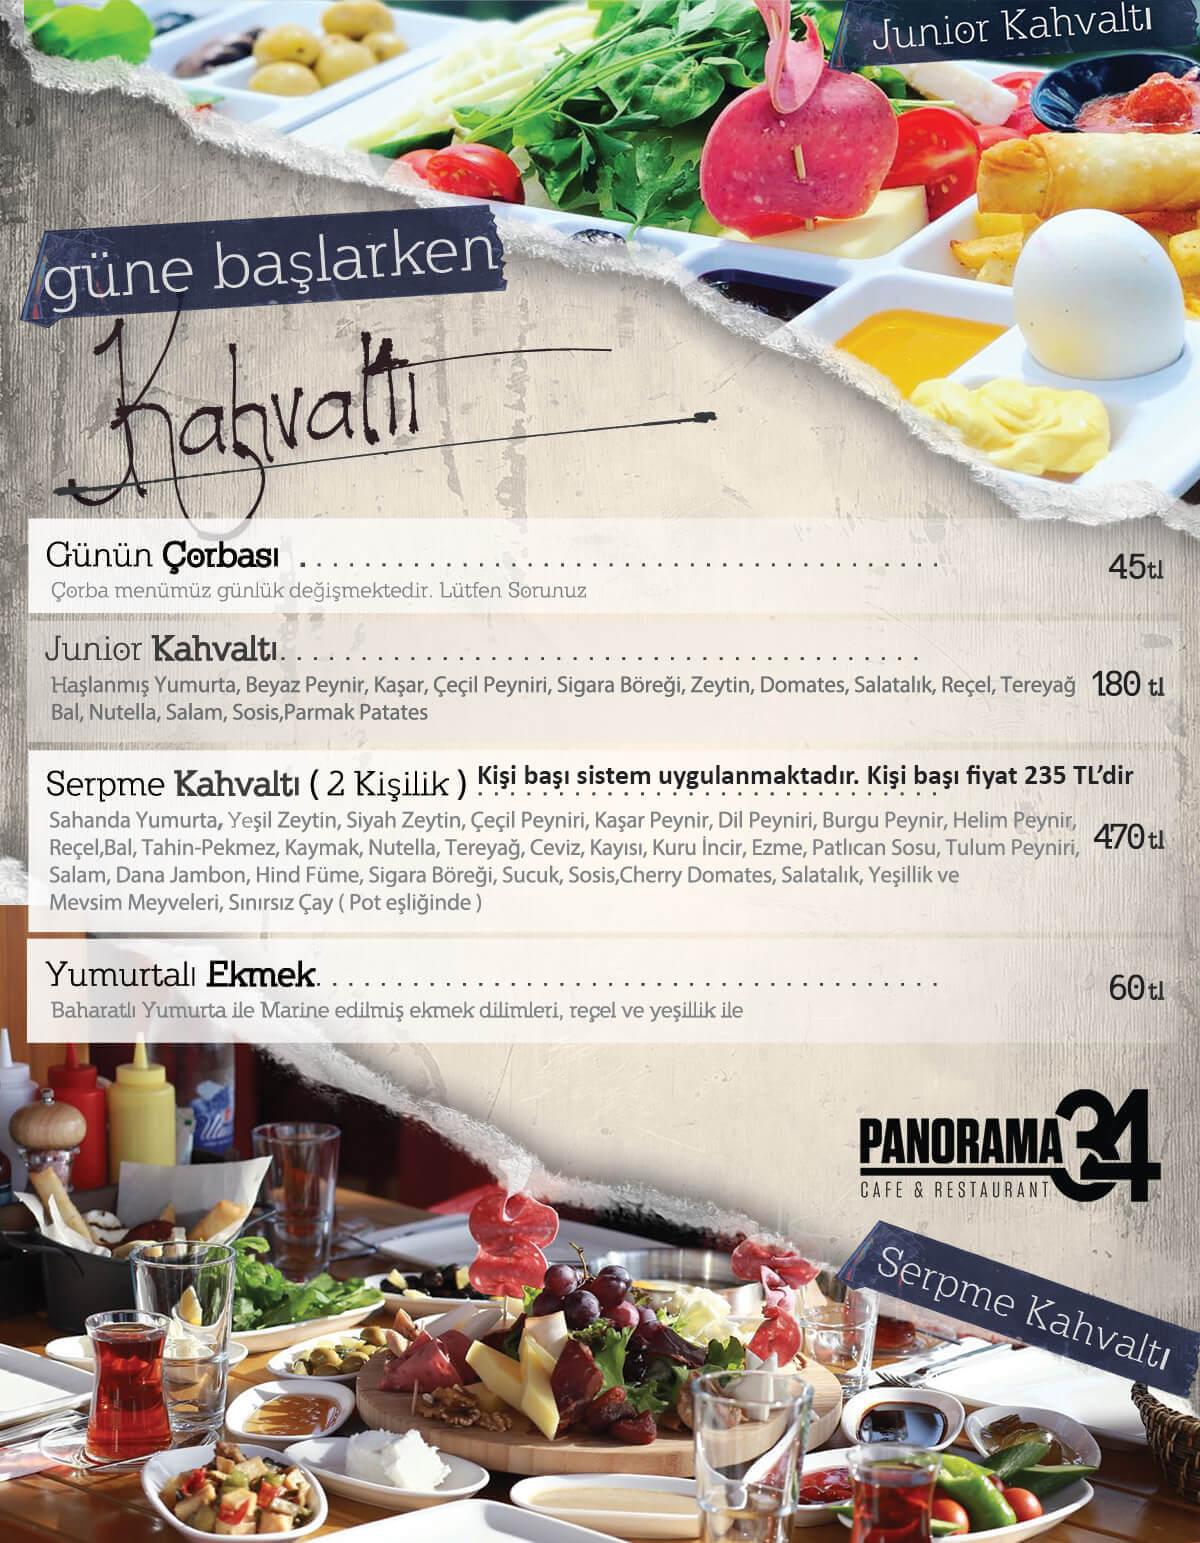 Panorama34 Cafe & Restaurant